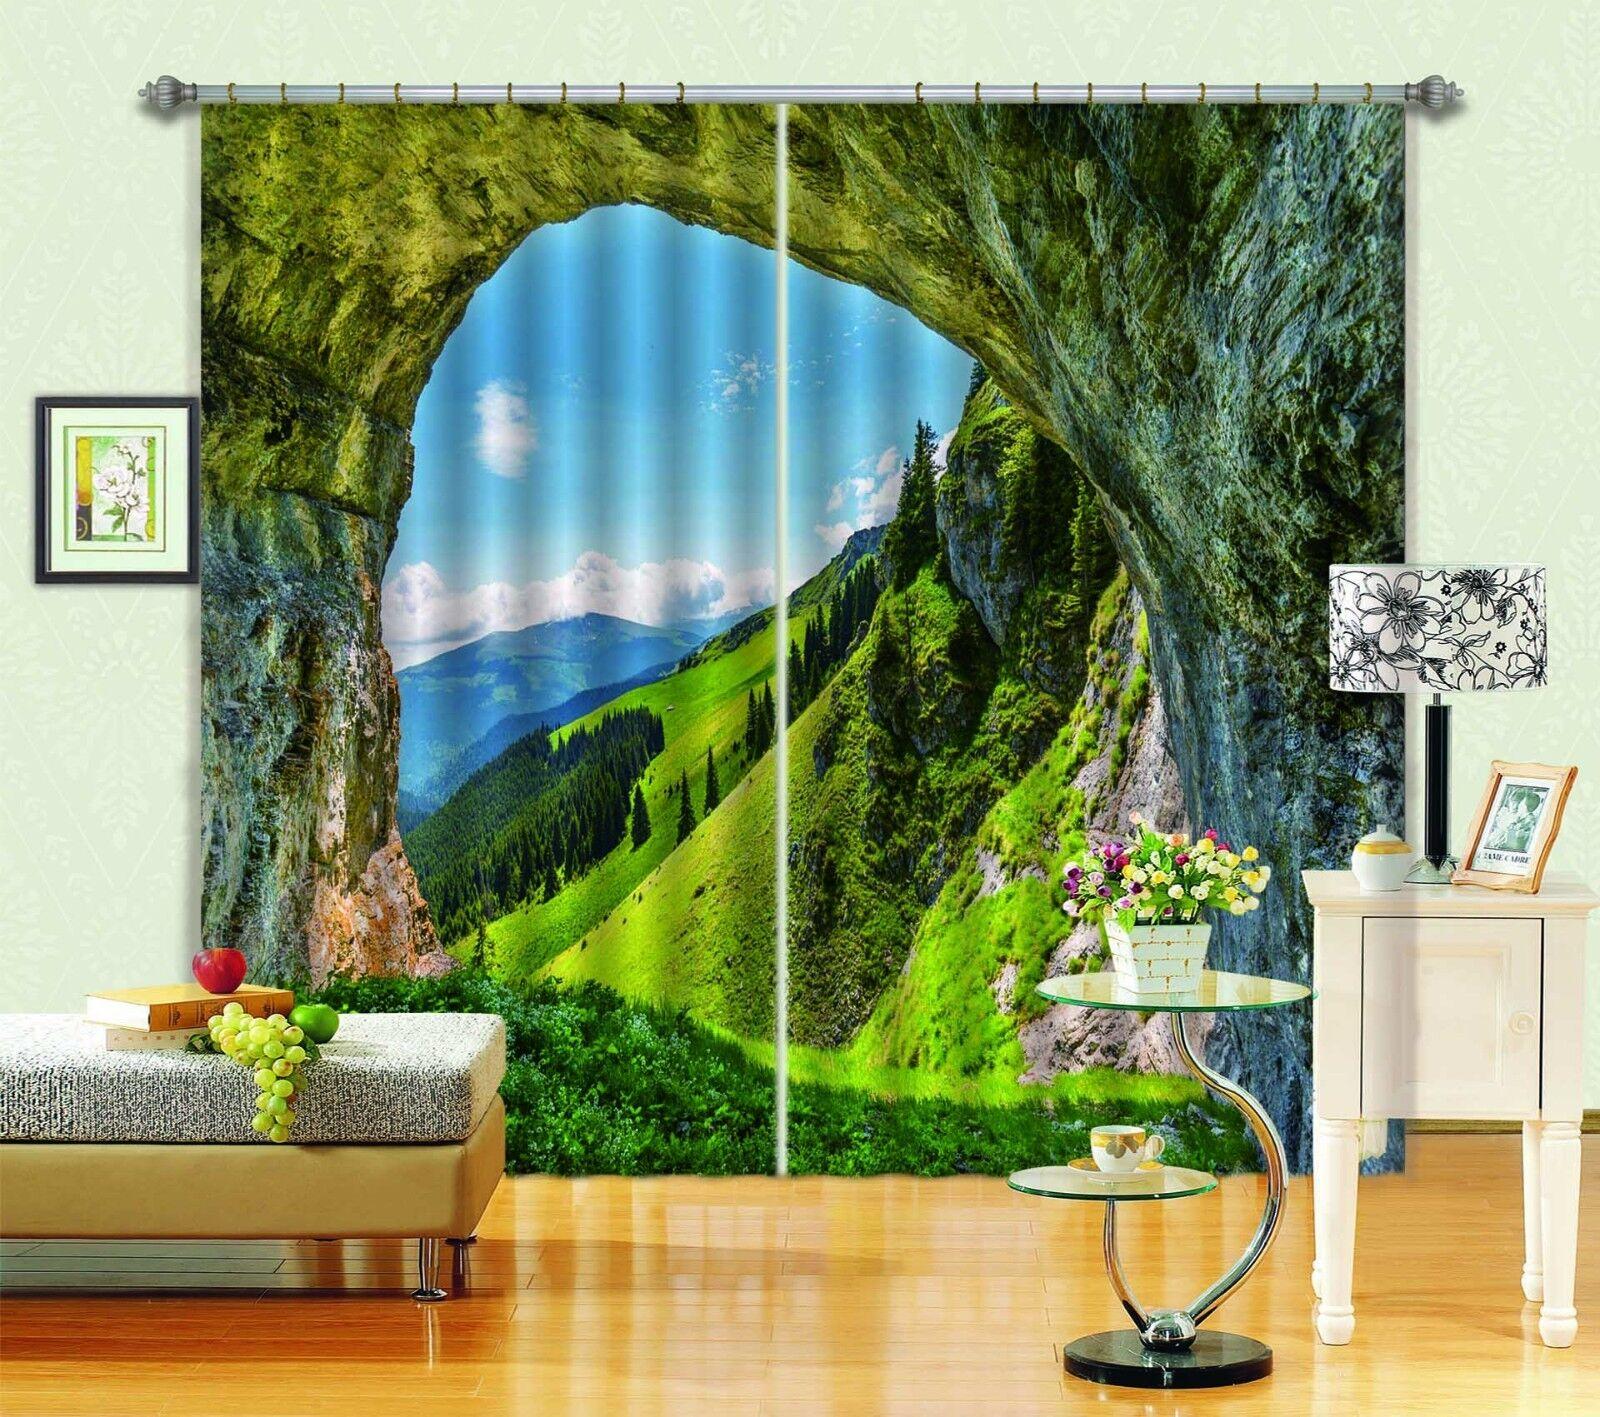 Cueva de montaña 3D 6 Cortinas de impresión de cortina de foto Blockout Ventana De Tela Cortinas